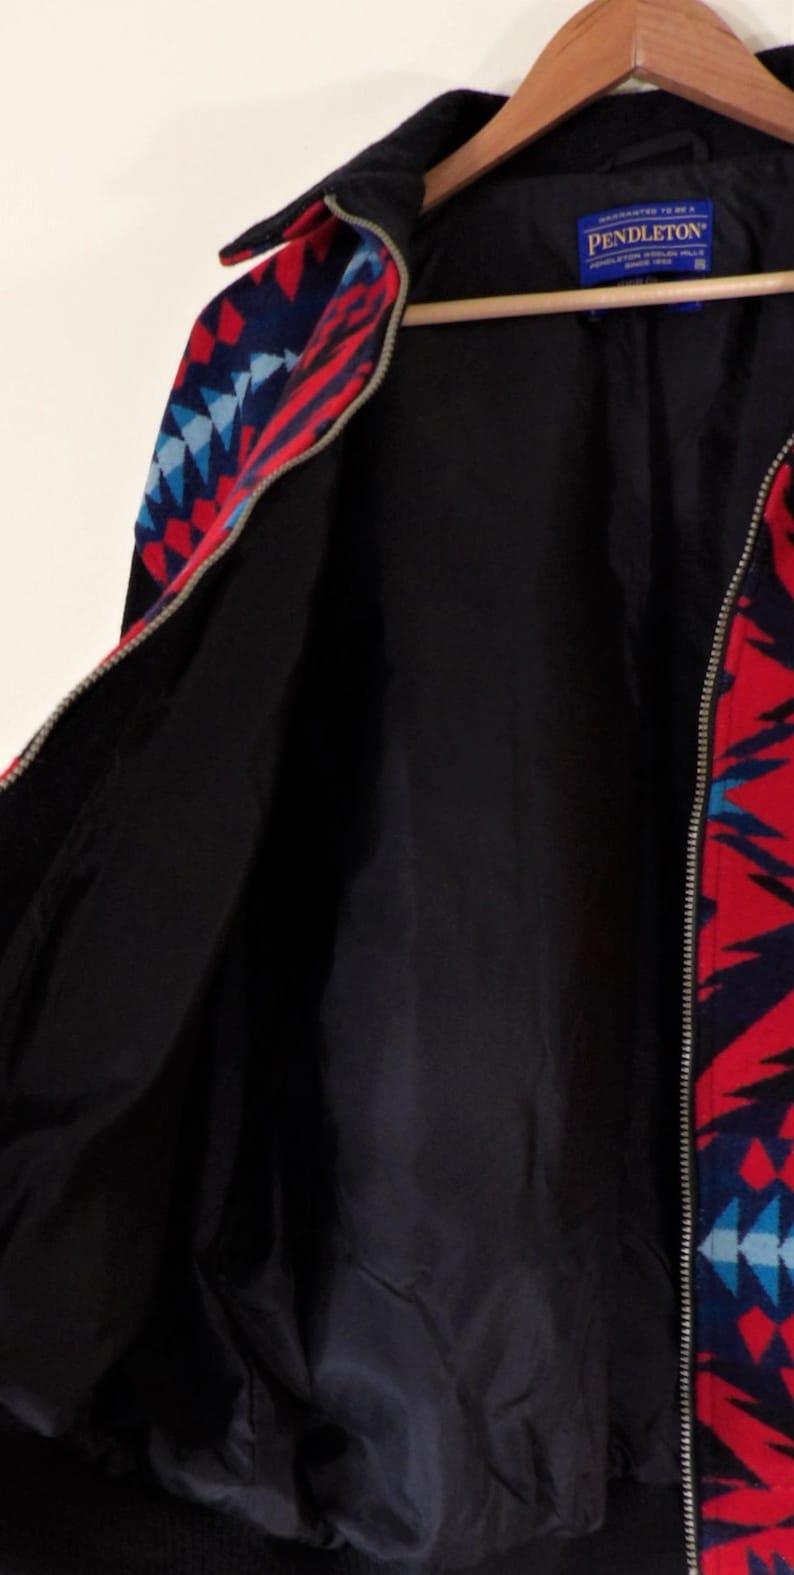 Unworn Discontinued Pendleton High Grade Western Wear Wool Diamond Desert Navajo Lined Bomber Jacket Men/'s Chest 56